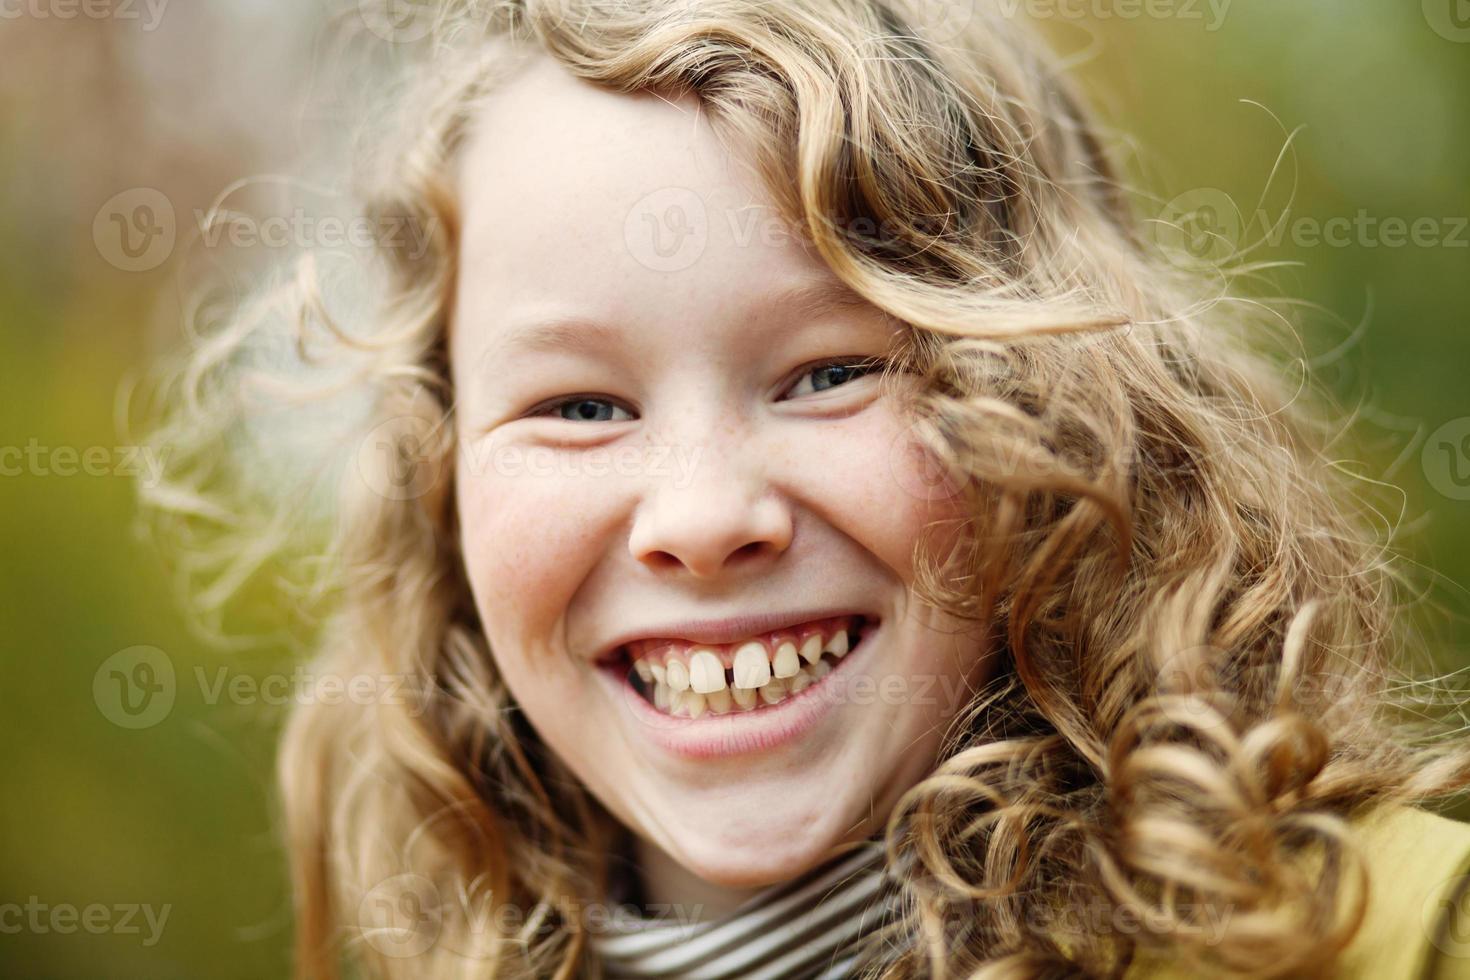 Outdoor portrait of happy blond girl photo